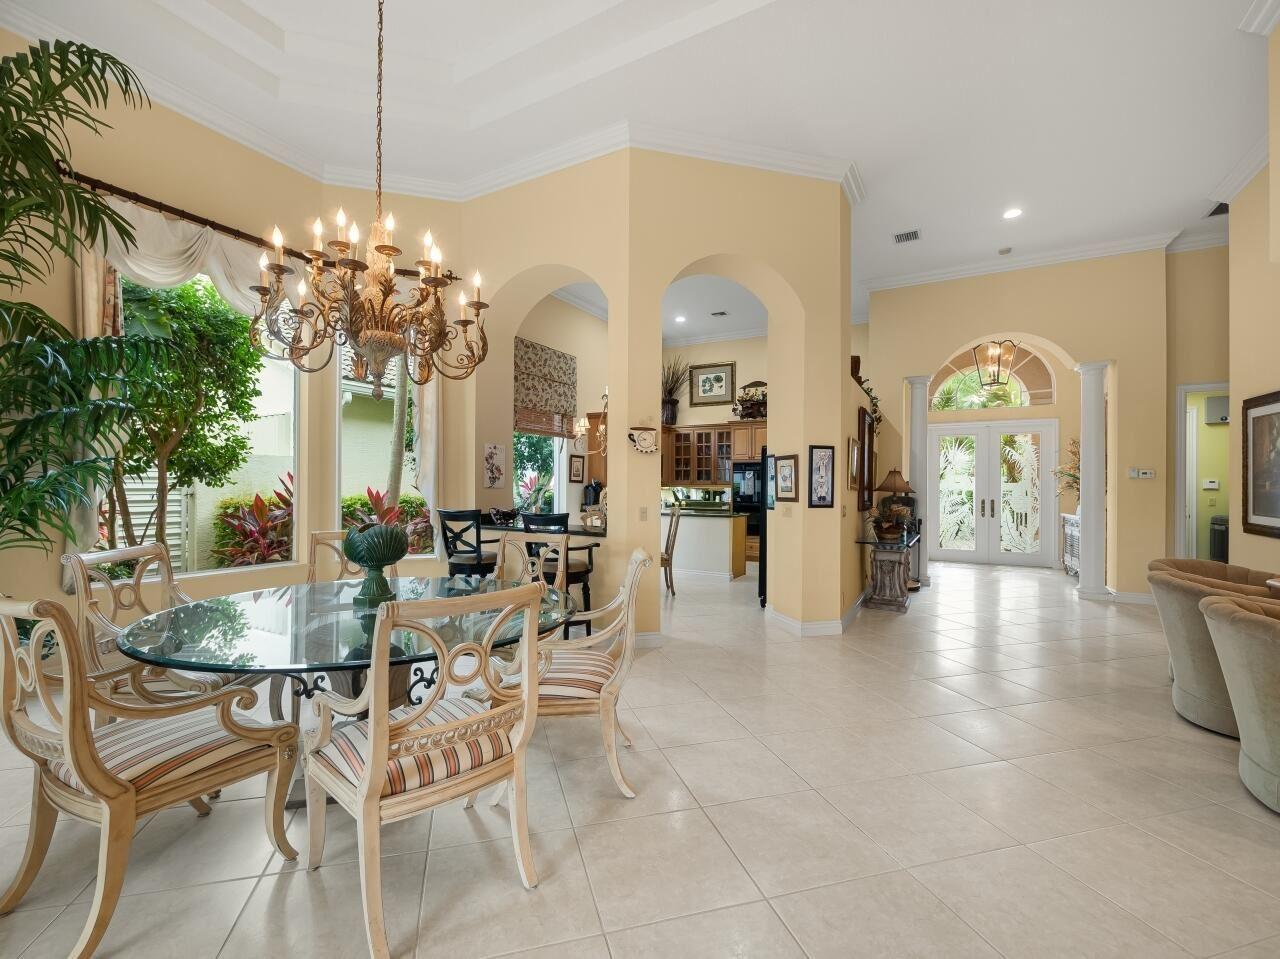 Photo of 125 San Marco Drive, Palm Beach Gardens, FL 33418 (MLS # RX-10734727)